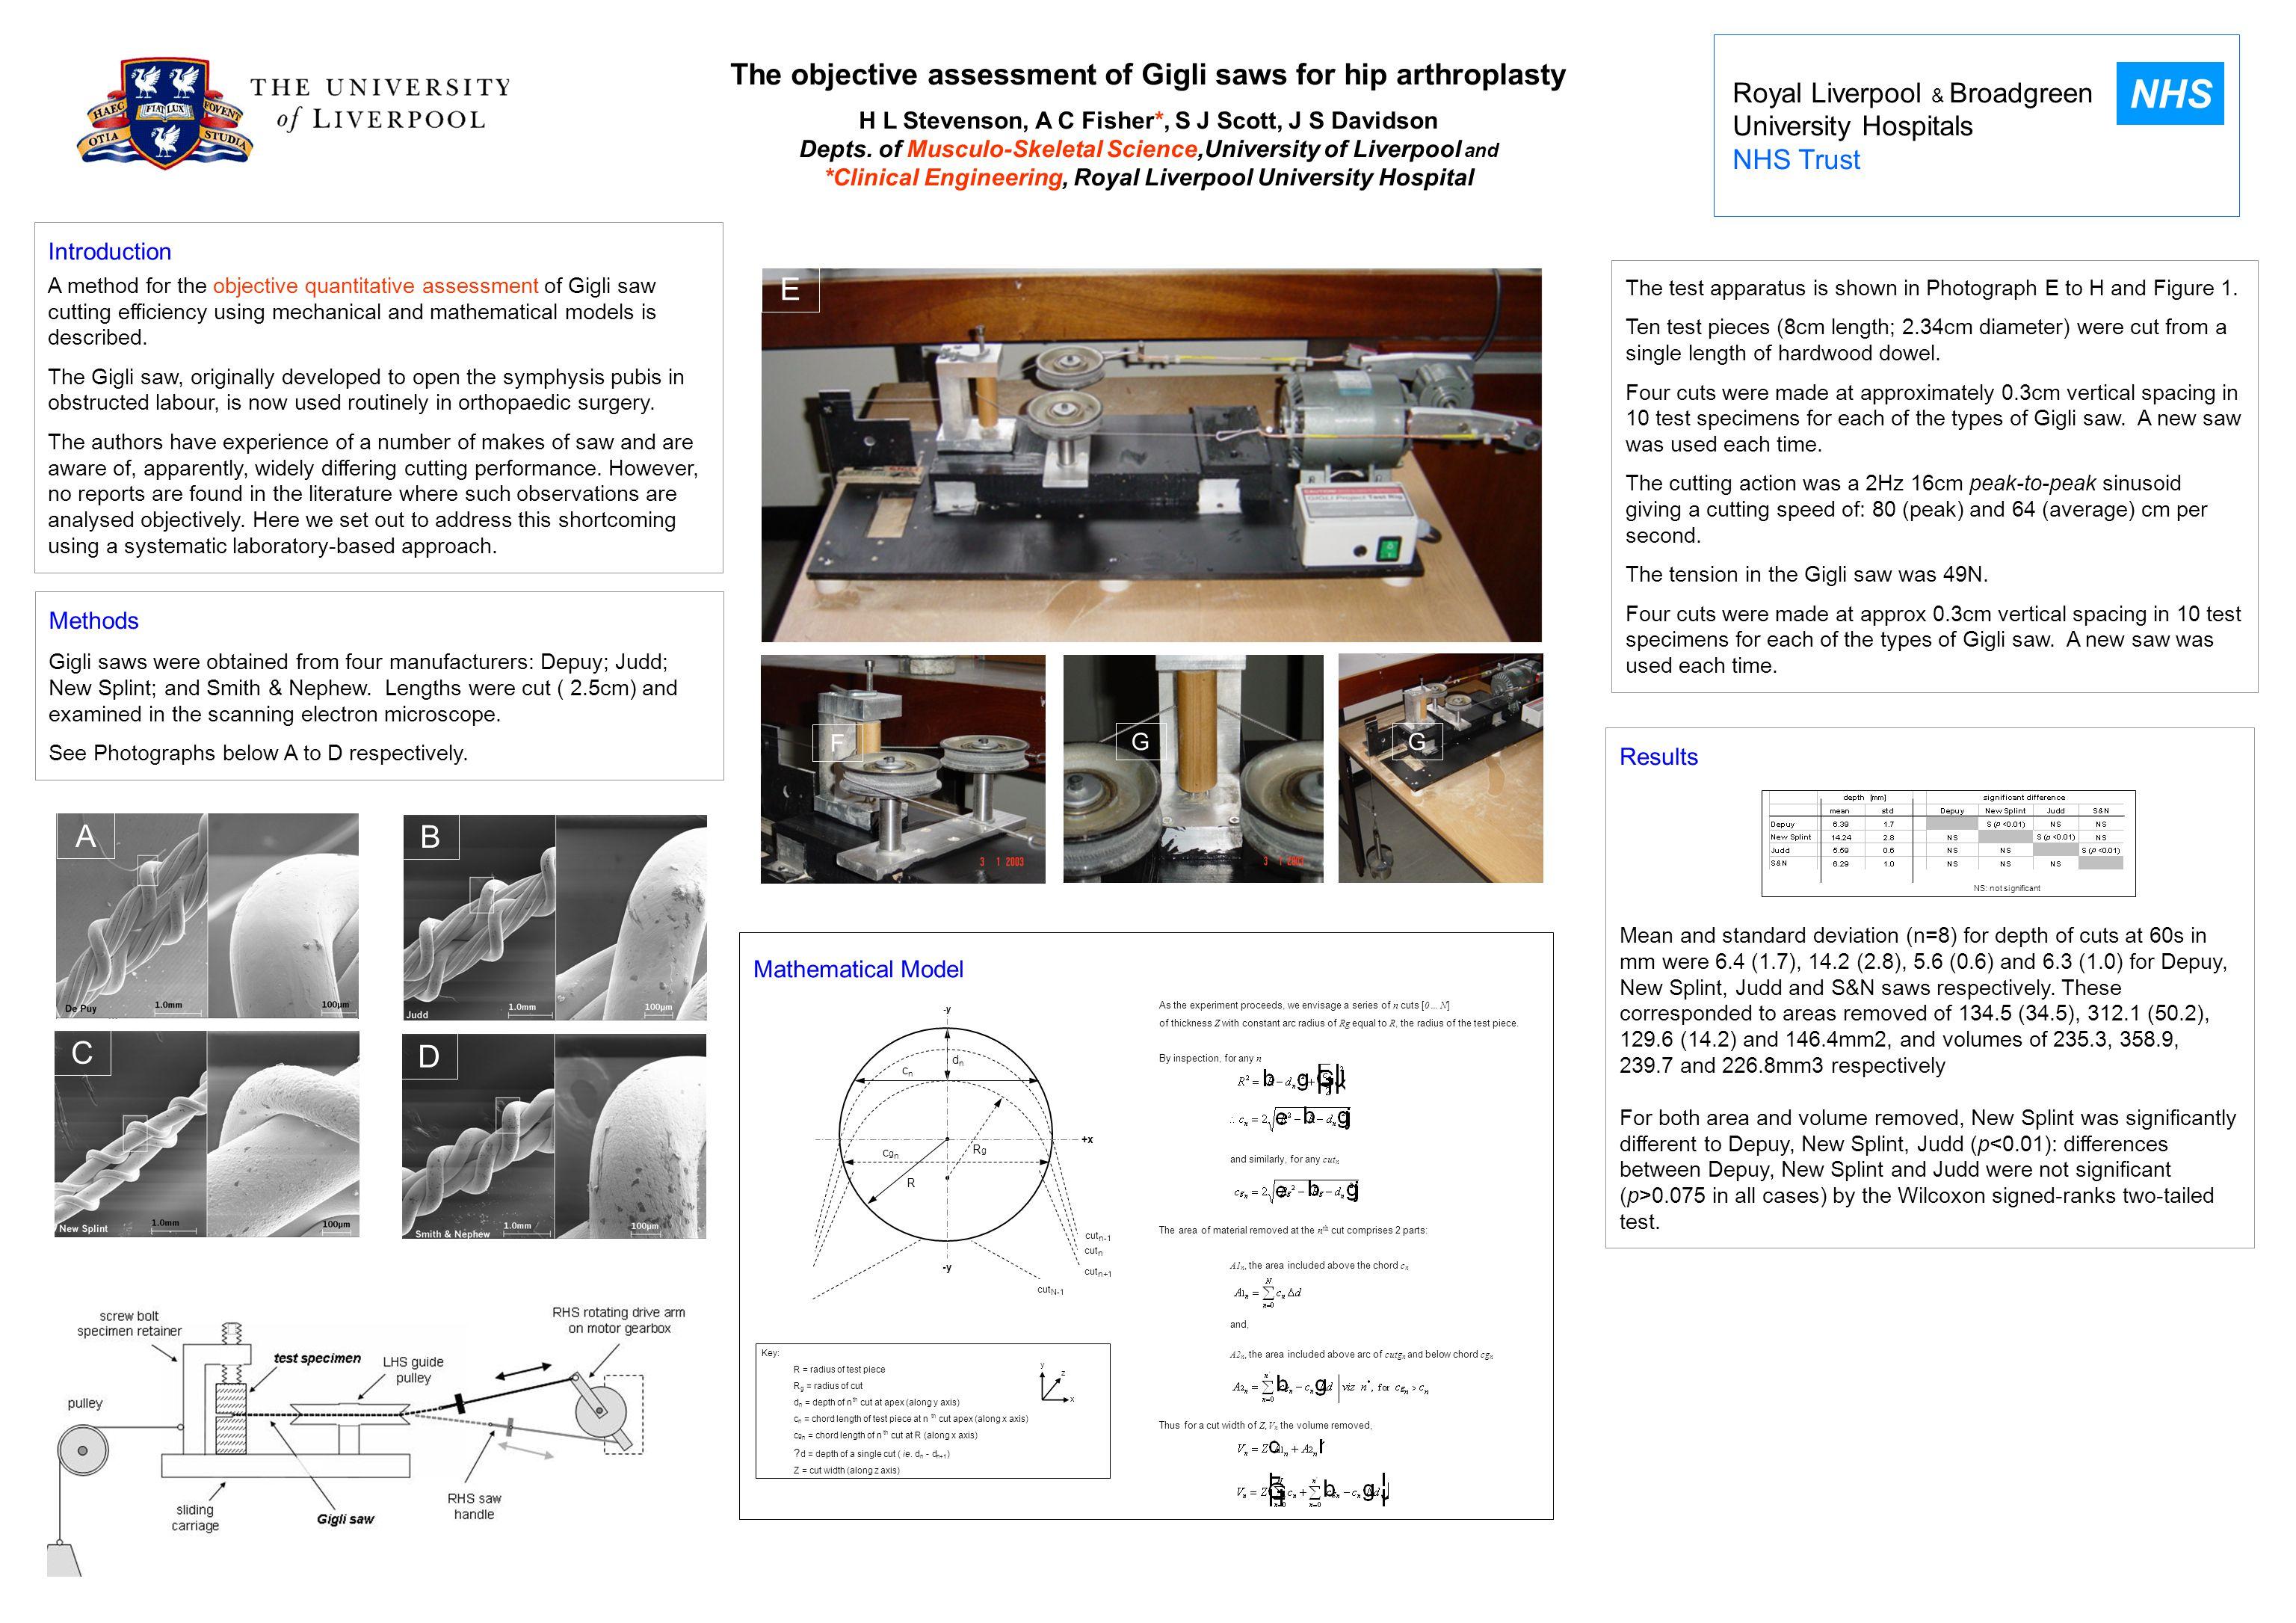 The objective assessment of Gigli saws for hip arthroplasty H L Stevenson, A C Fisher*, S J Scott, J S Davidson Depts.